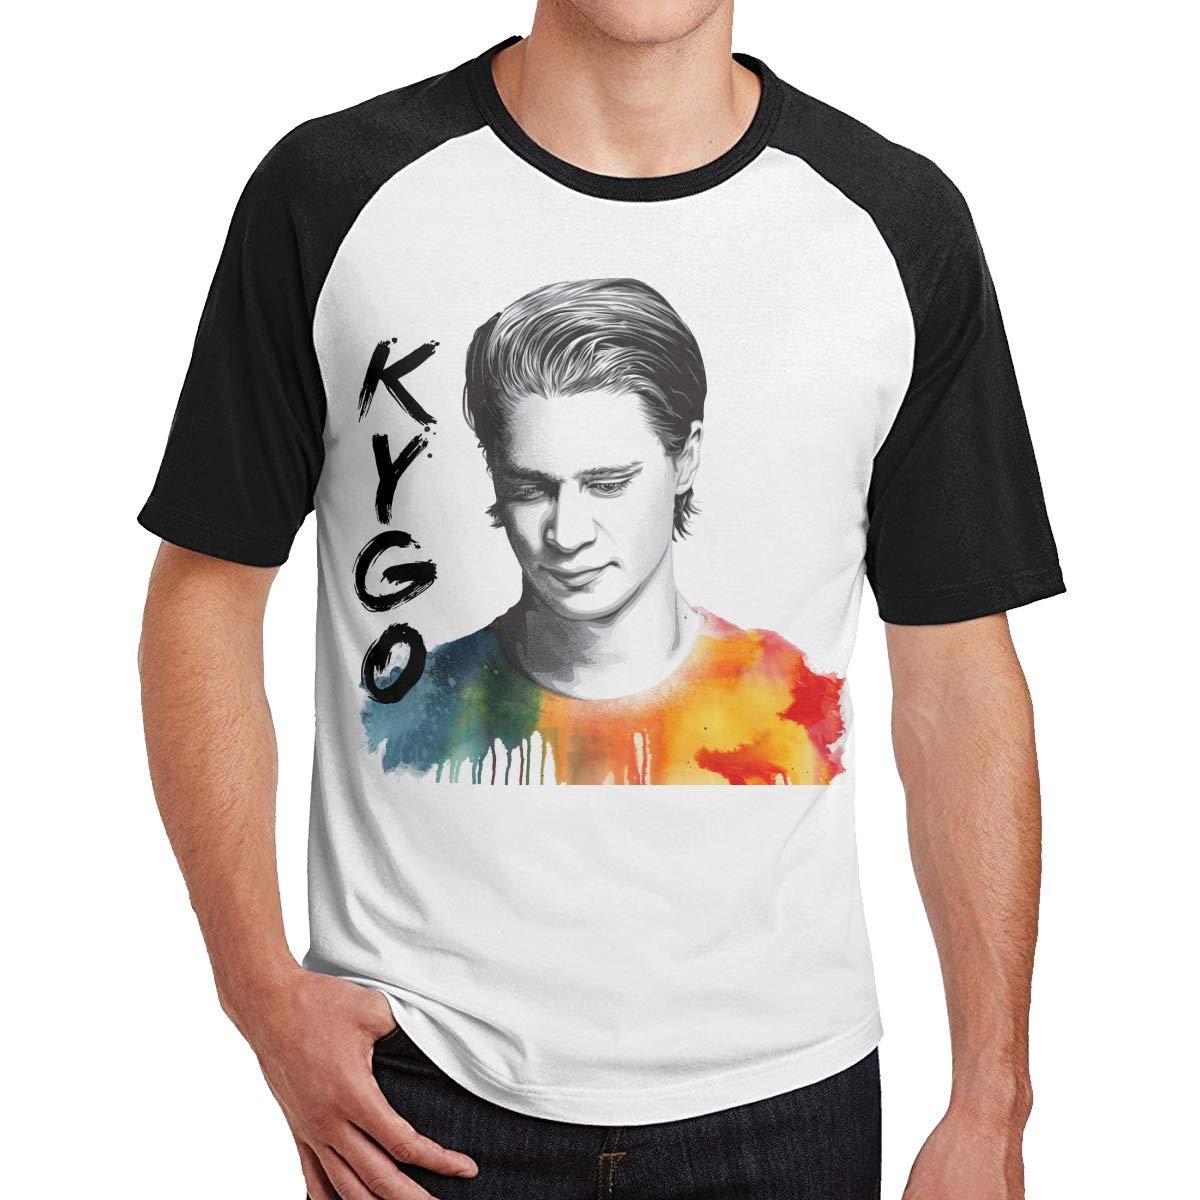 Kygo Music Band Singer Short Sleeve Cool Baseball T Shirt